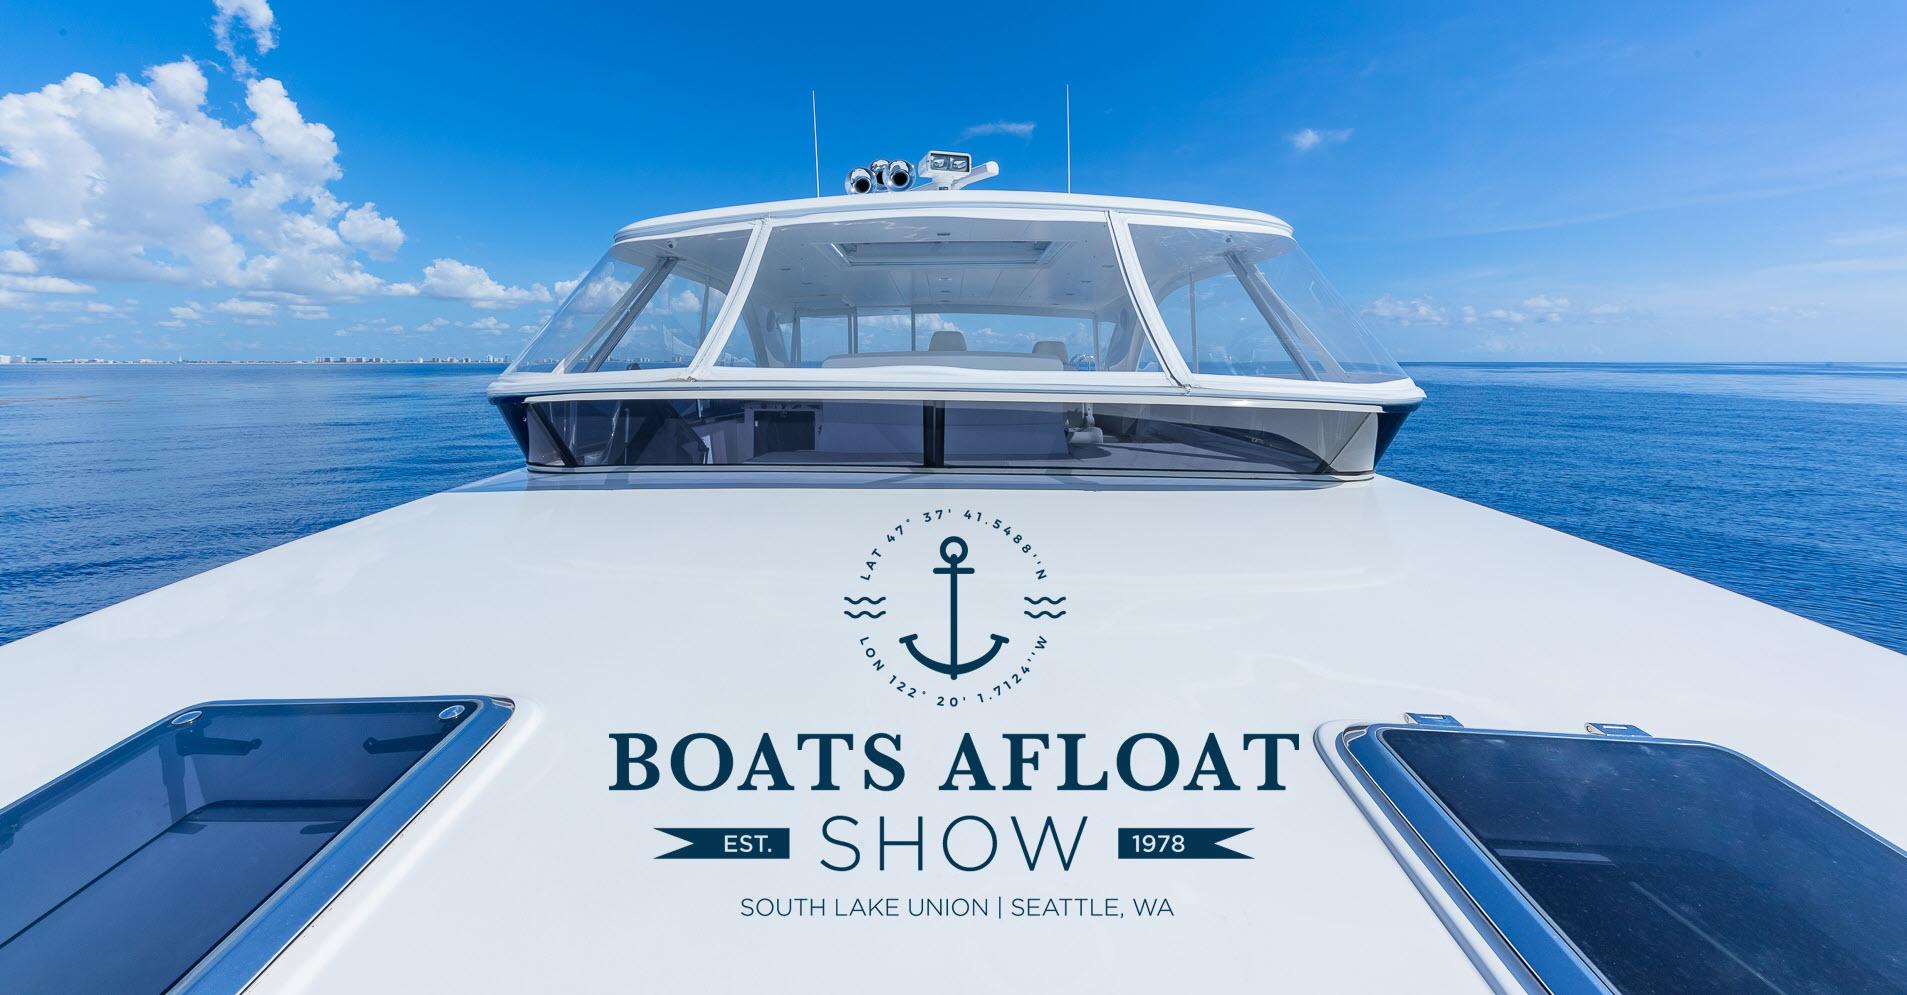 boats afloat show 2021